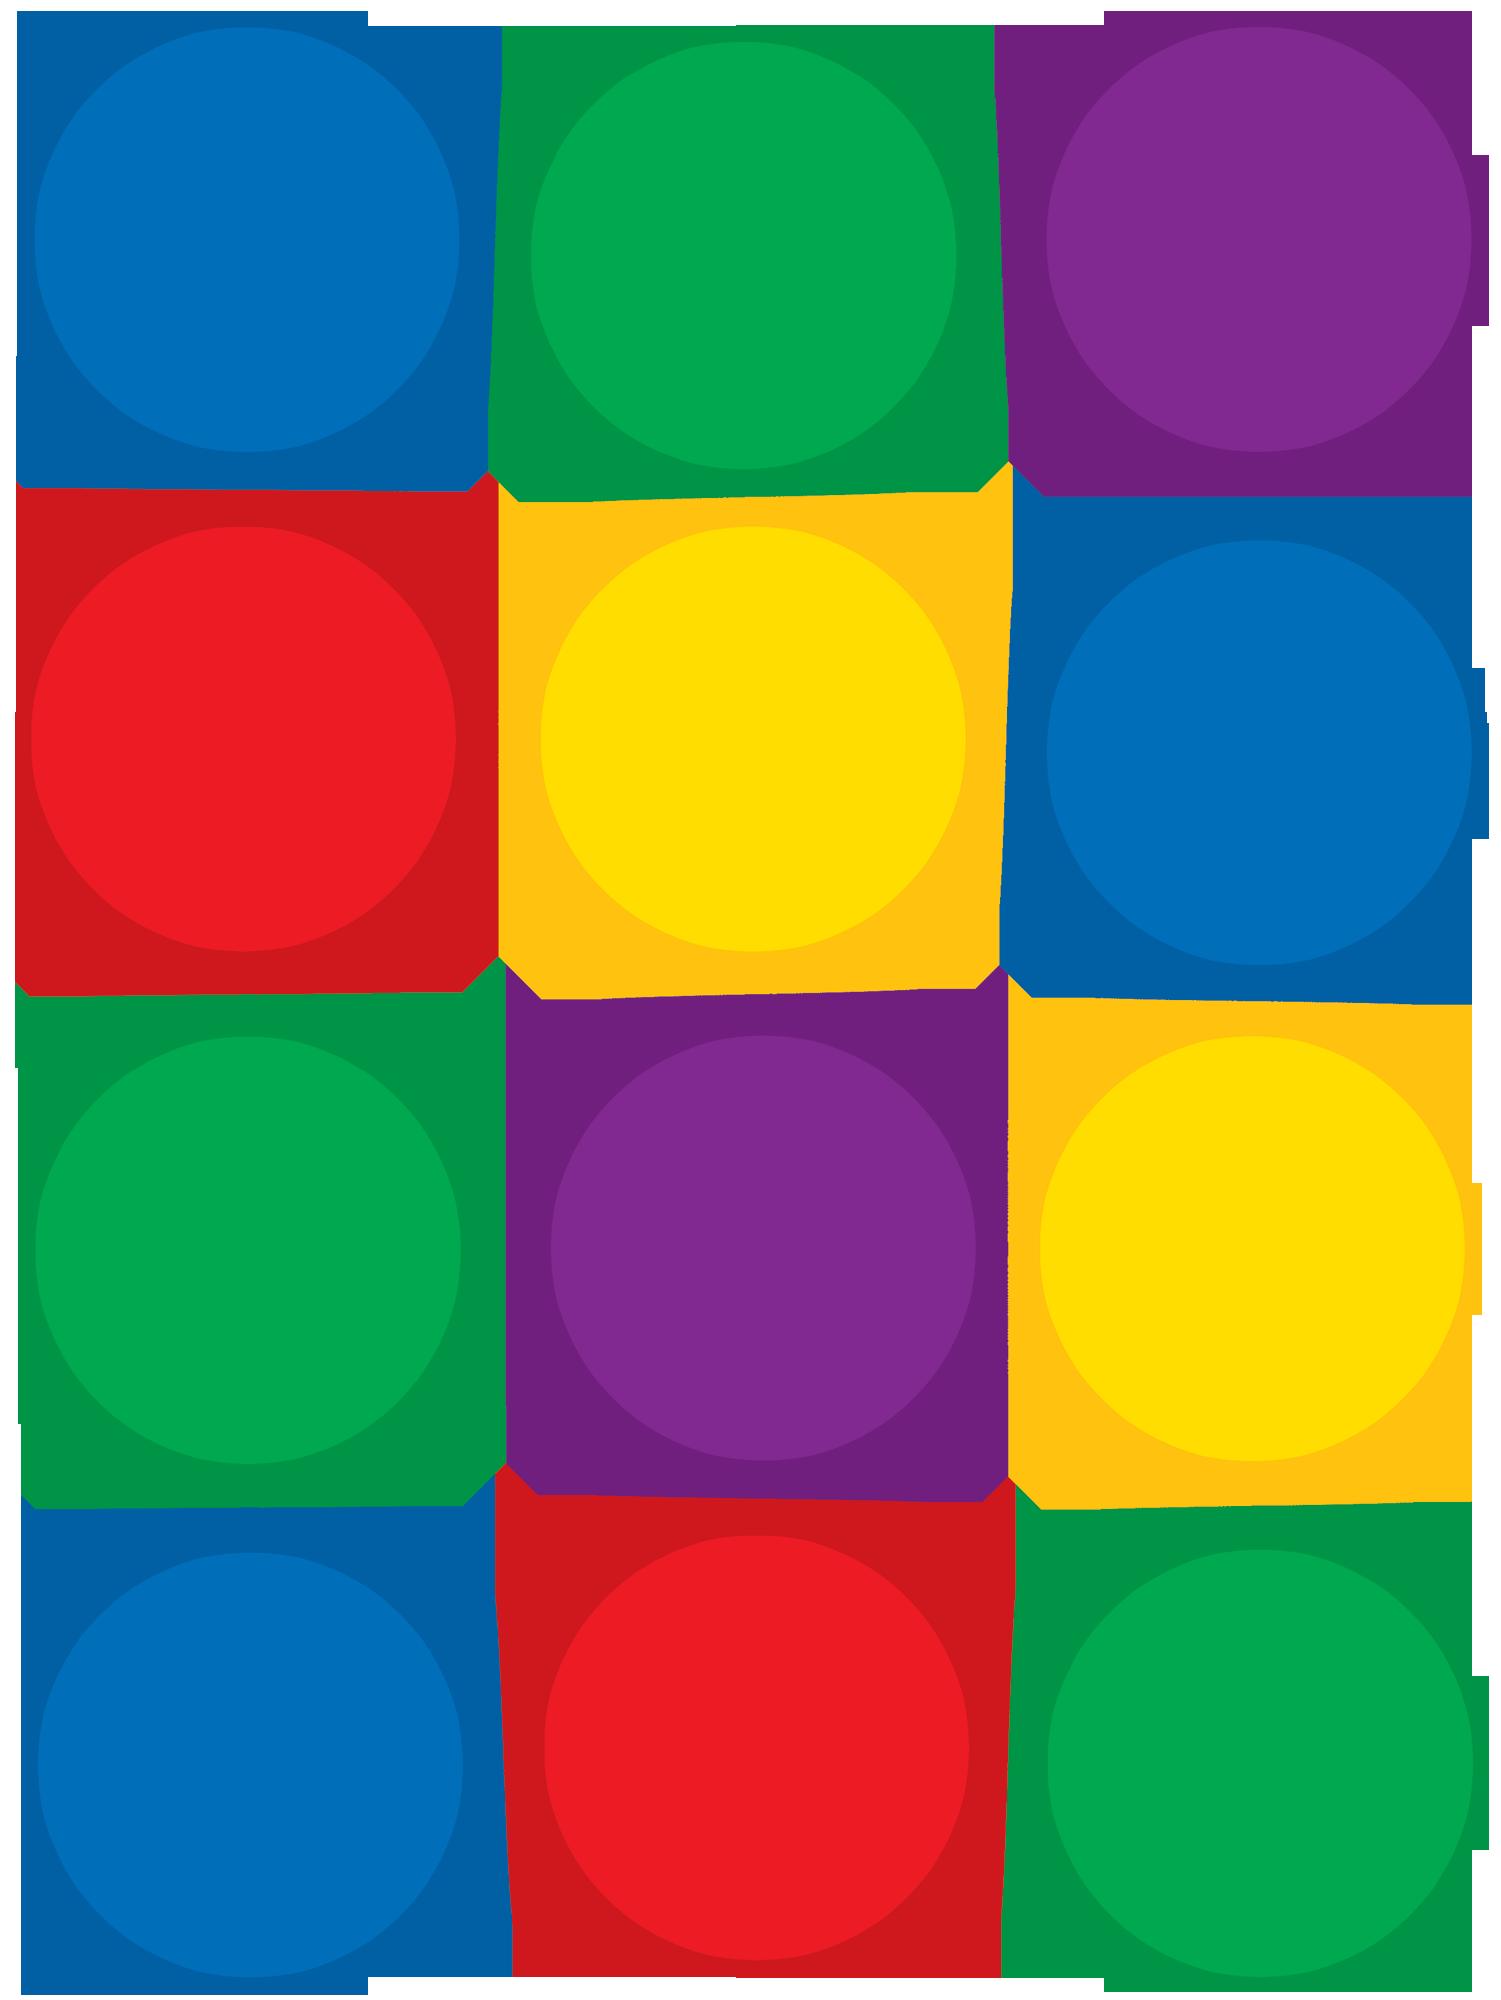 картинка цветные кружочки на прозрачном фоне плата